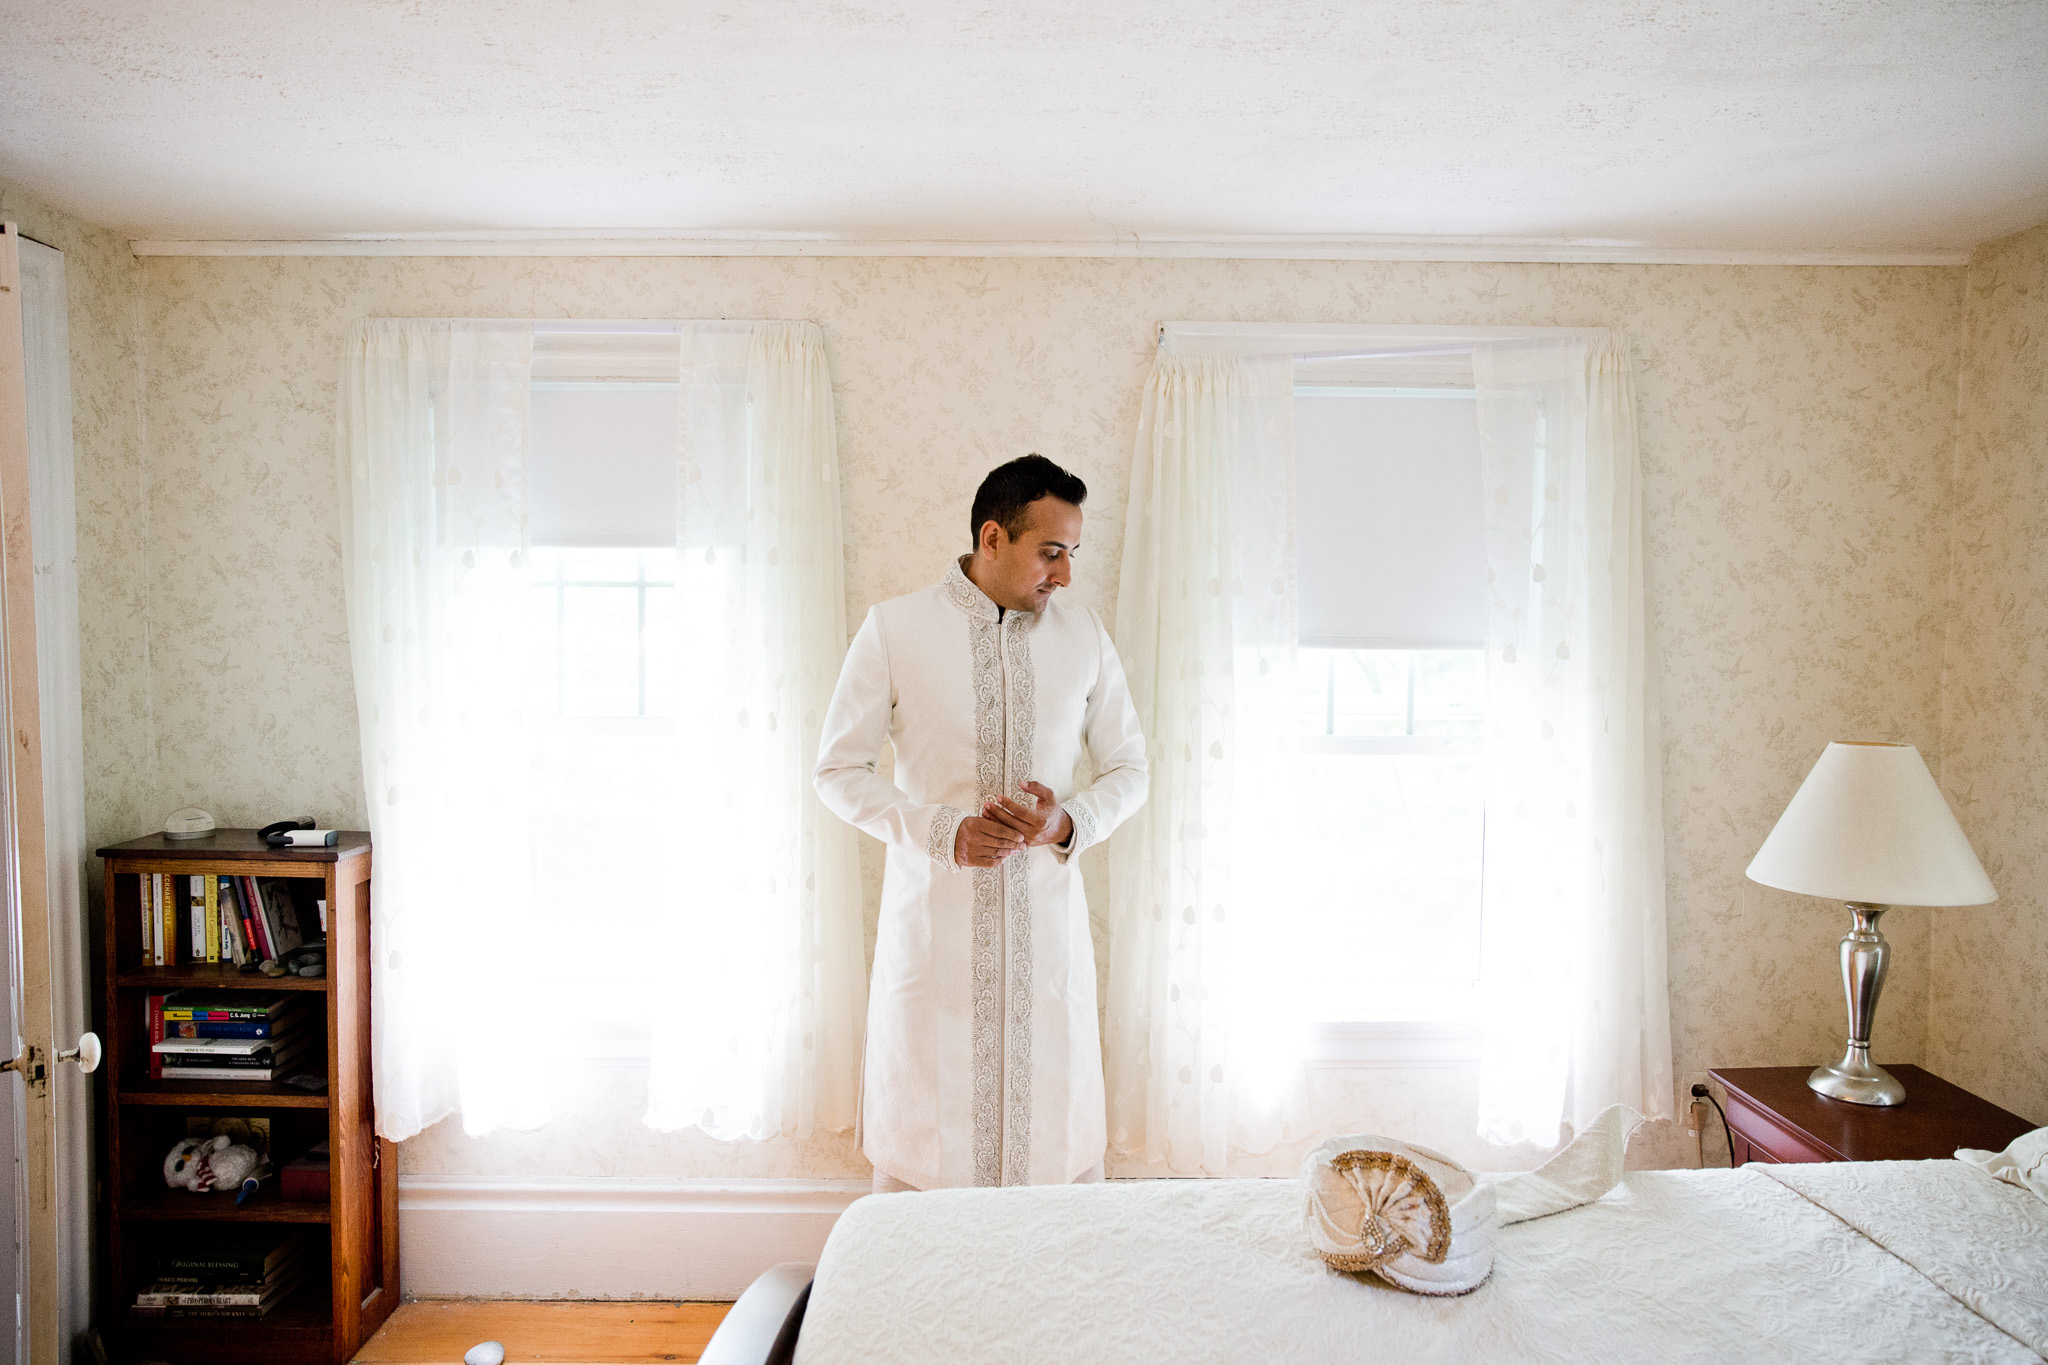 018_Canada-documentary-wedding-photograp